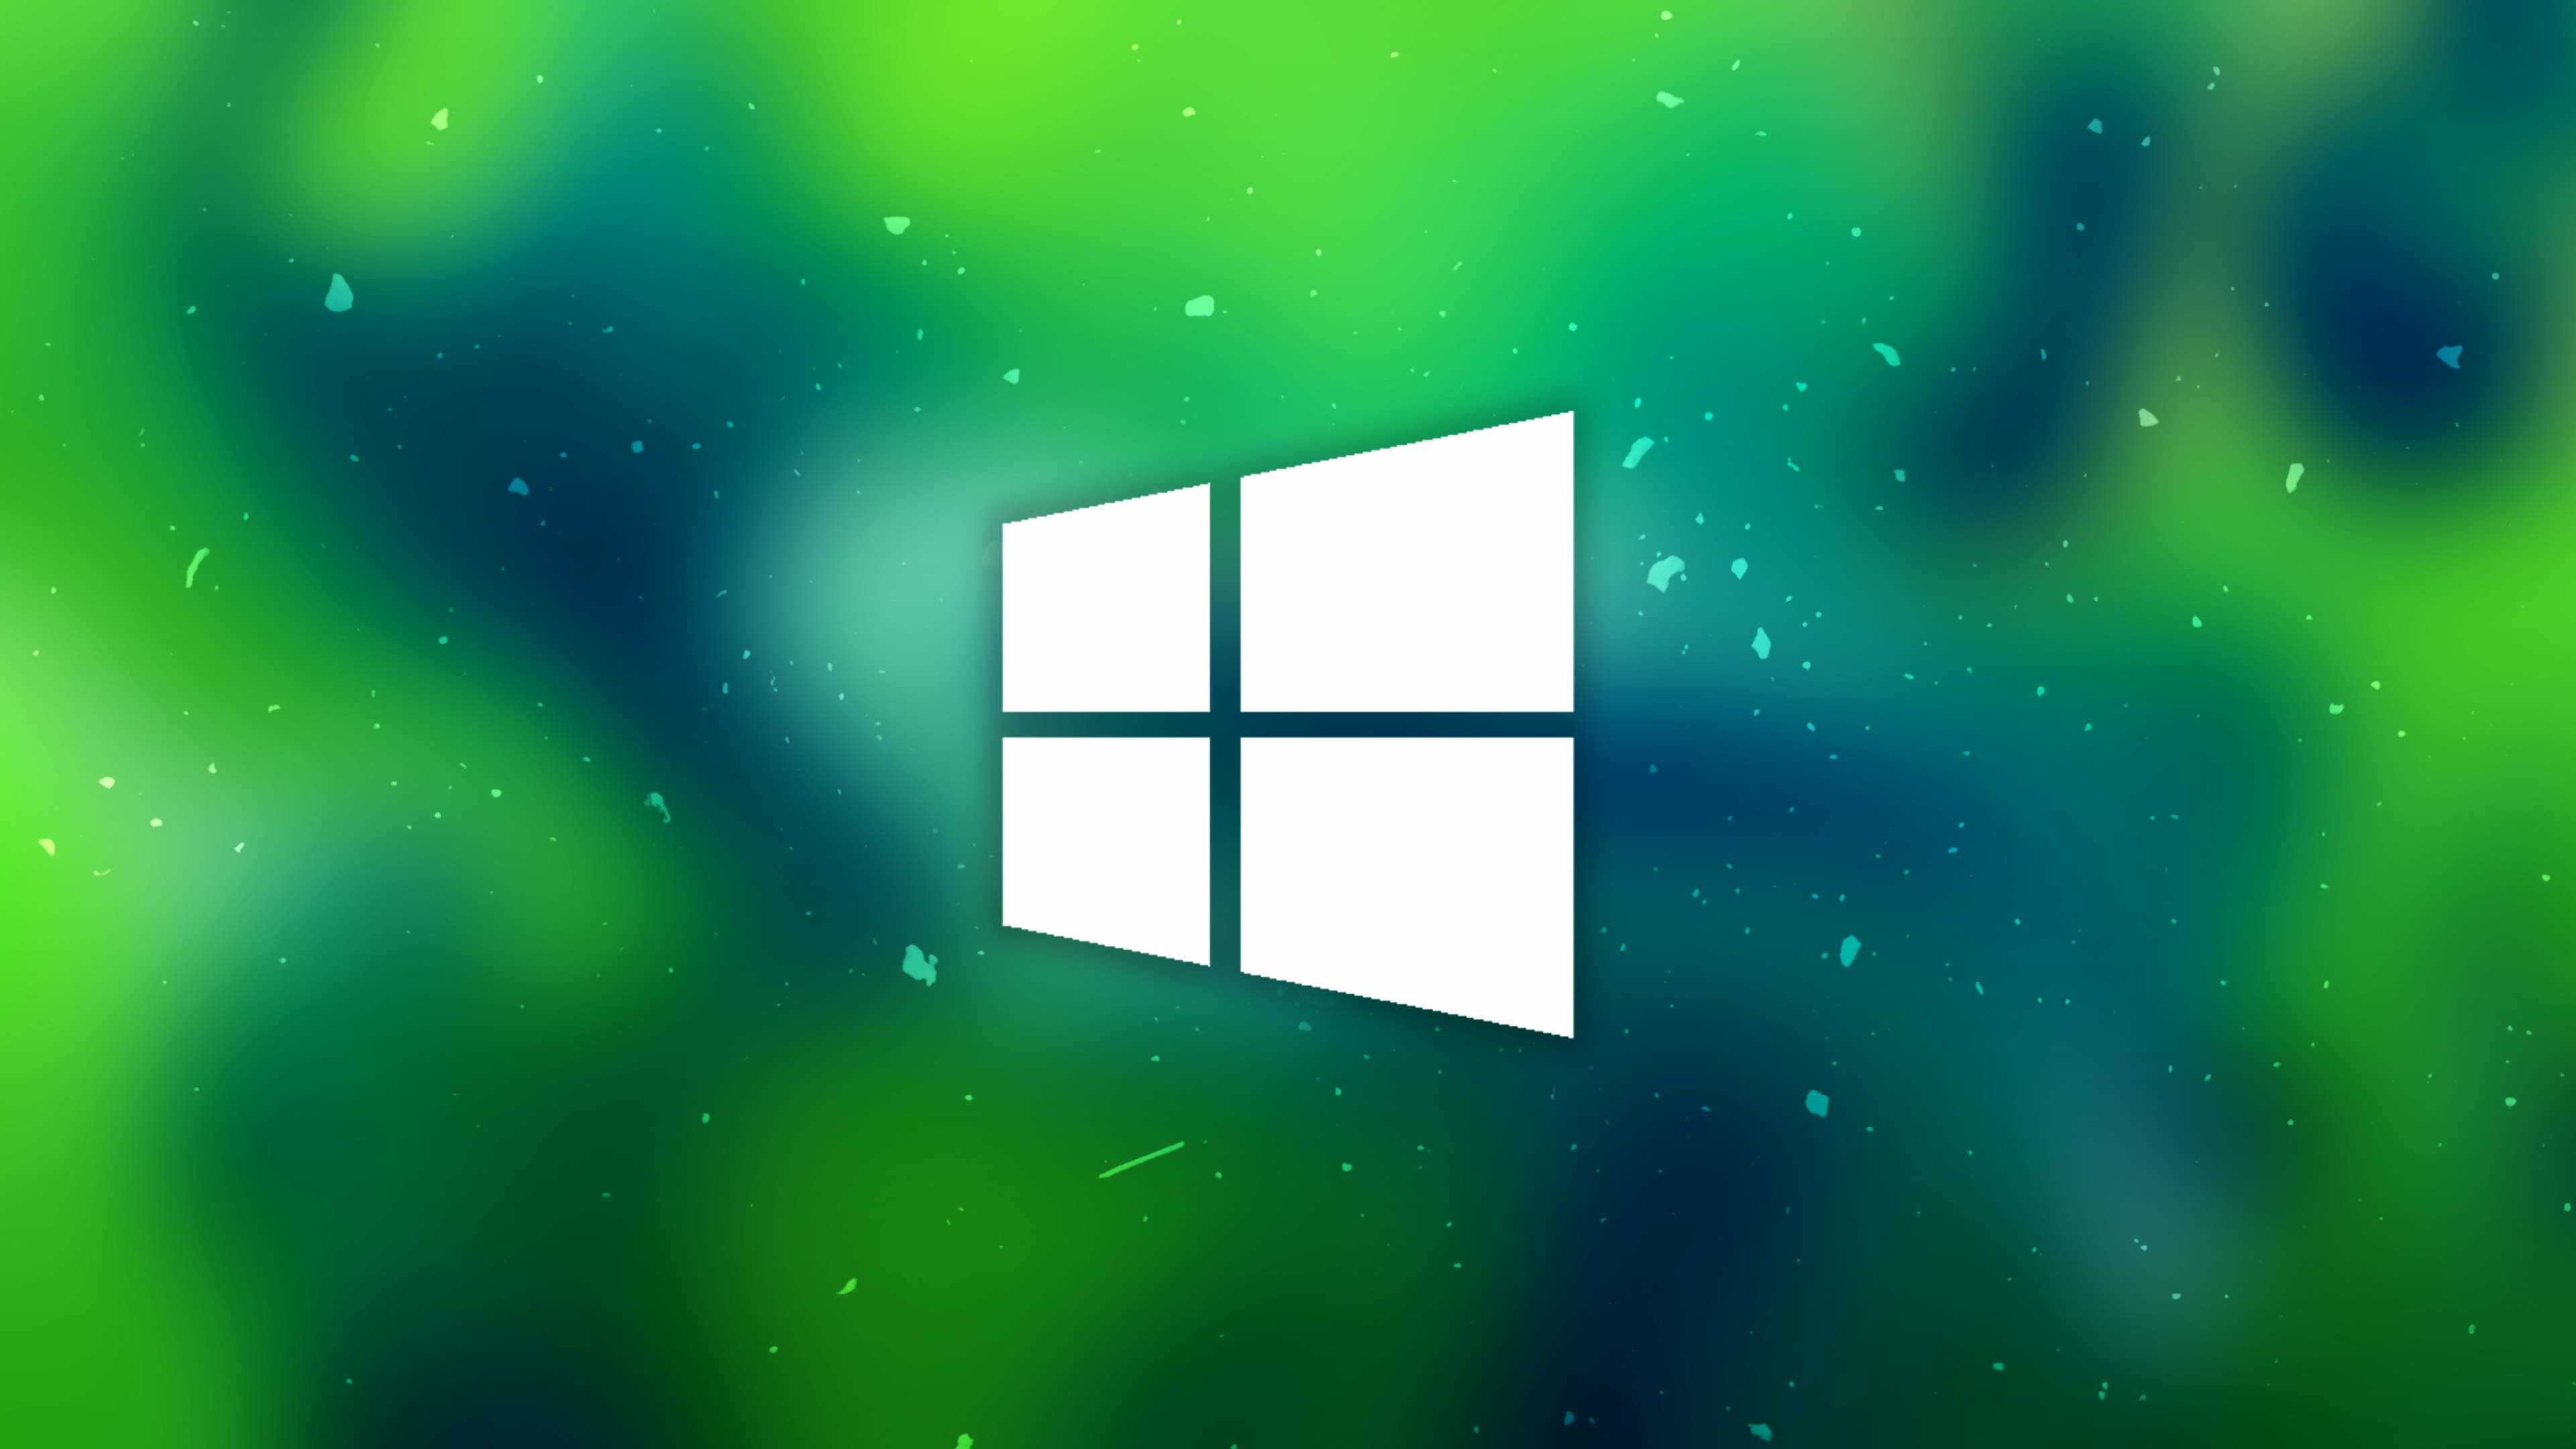 4k Windows 10 Wallpaper For Pc Data Src Hd Wallpaper 4k Wallpaper For Pc 3840x2160 Wallpaper Teahub Io